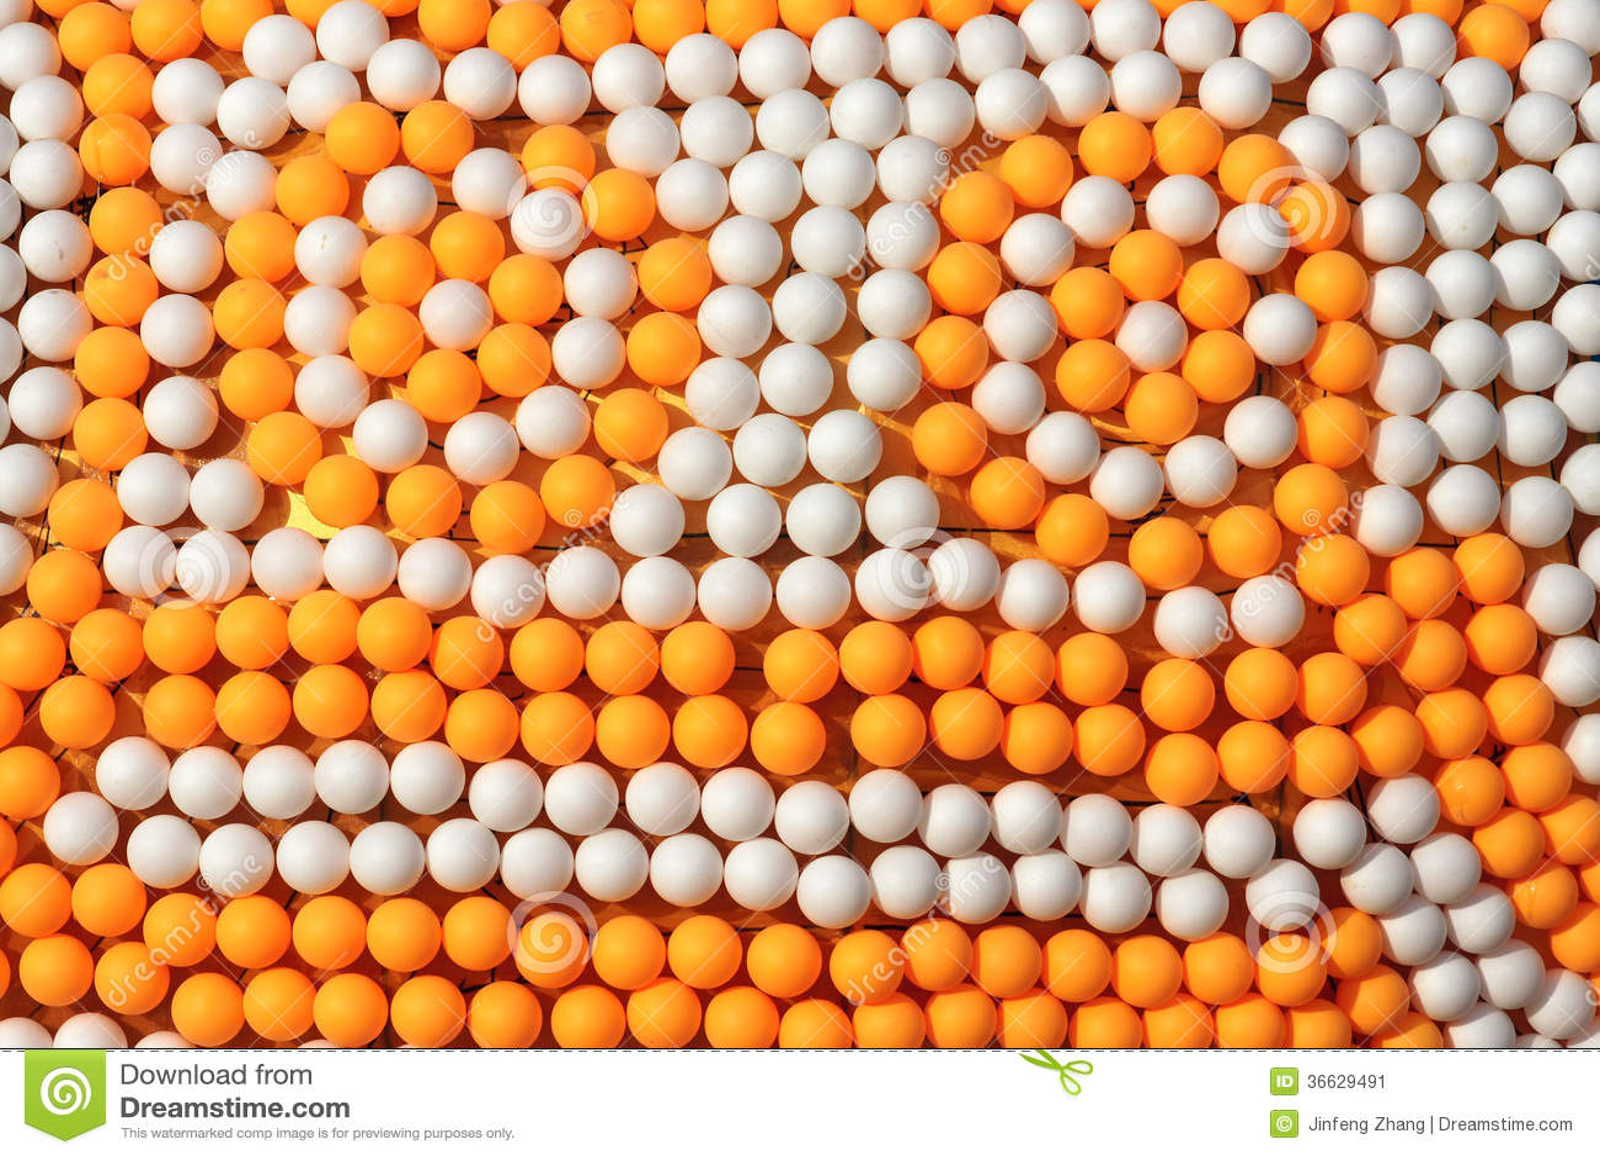 Ping pong balls stock image image 36629491 - How are ping pong balls made ...